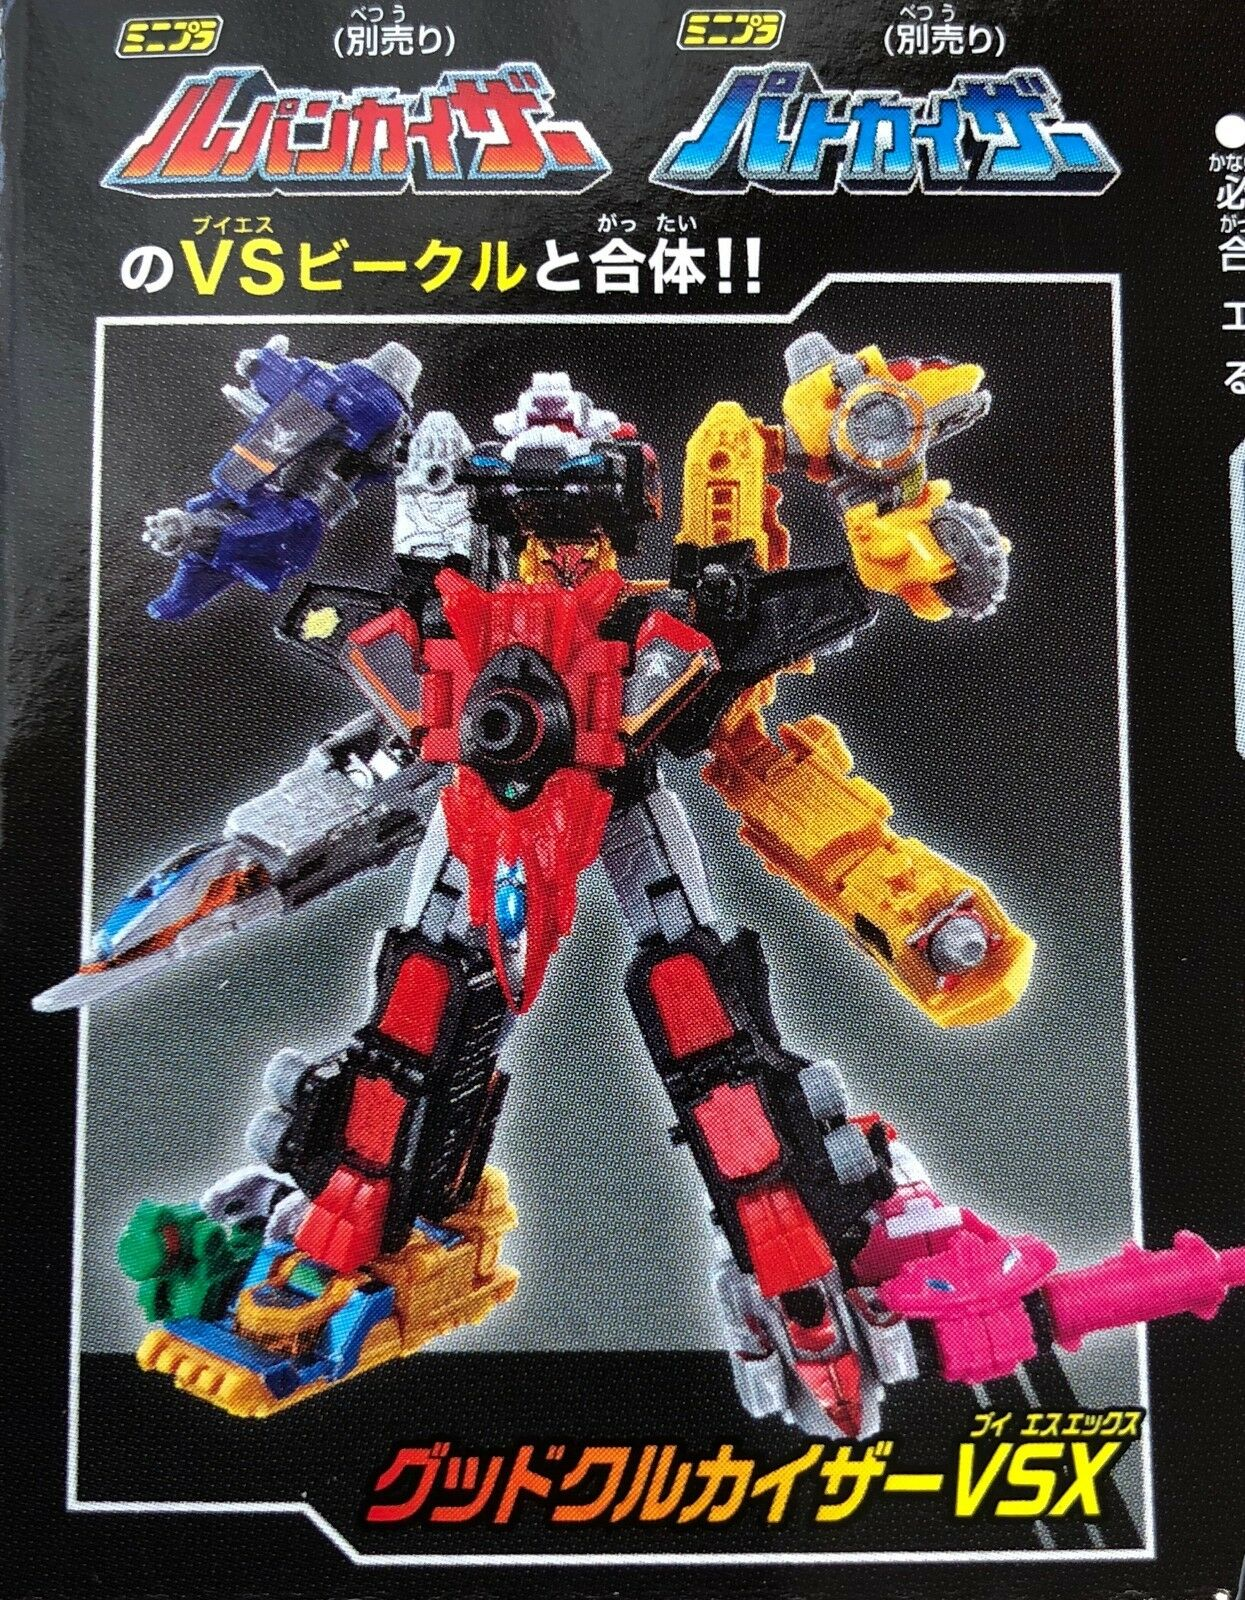 Japón Raro minipla Modelo Megazord buena Cool Kaiser Vsx Power Rangers lupinranger